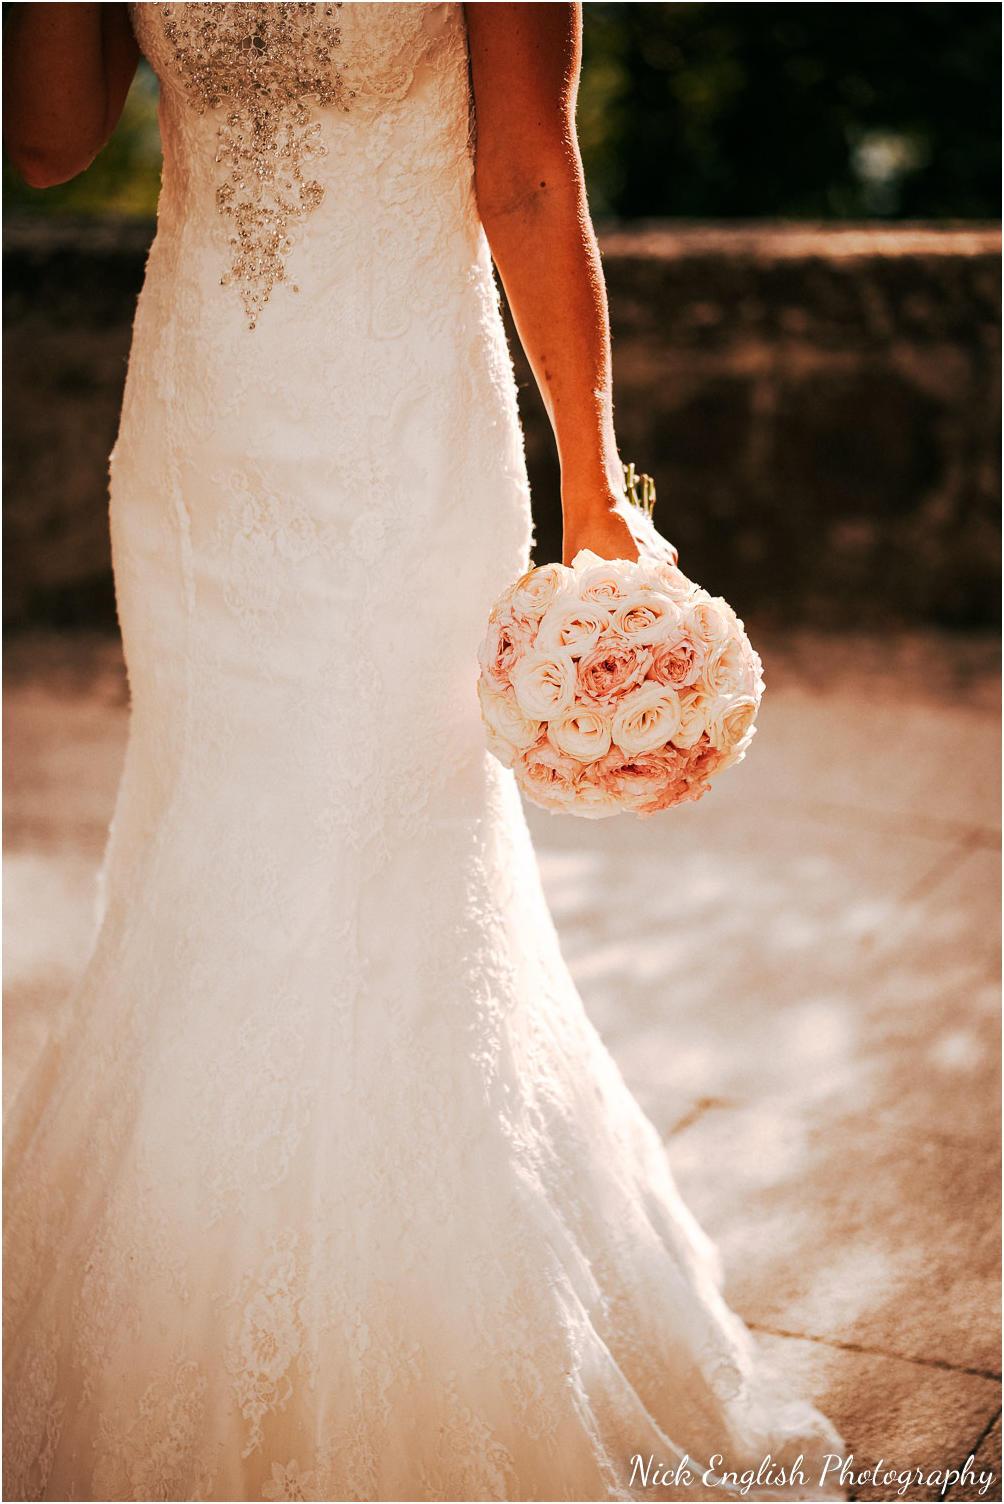 Destination_Wedding_Photographer_Slovenia_Nick_English_Photography-70-18.jpg